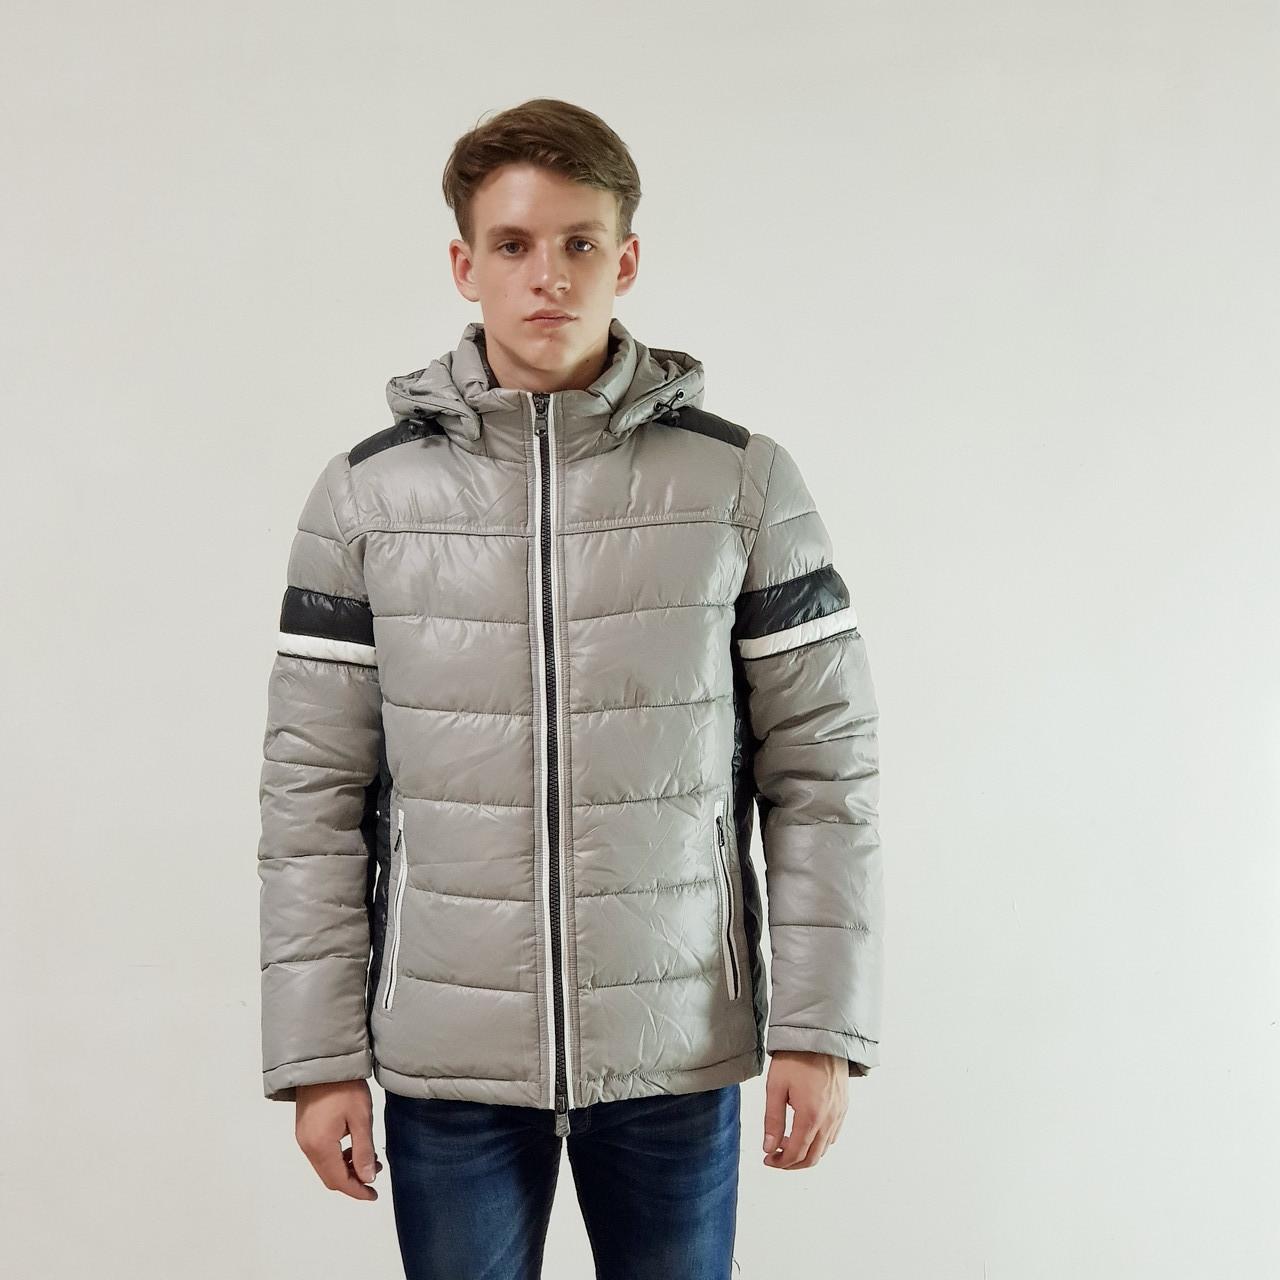 Куртка мужская зимняя Snowimage с капюшоном 48светло-серый 132-9354